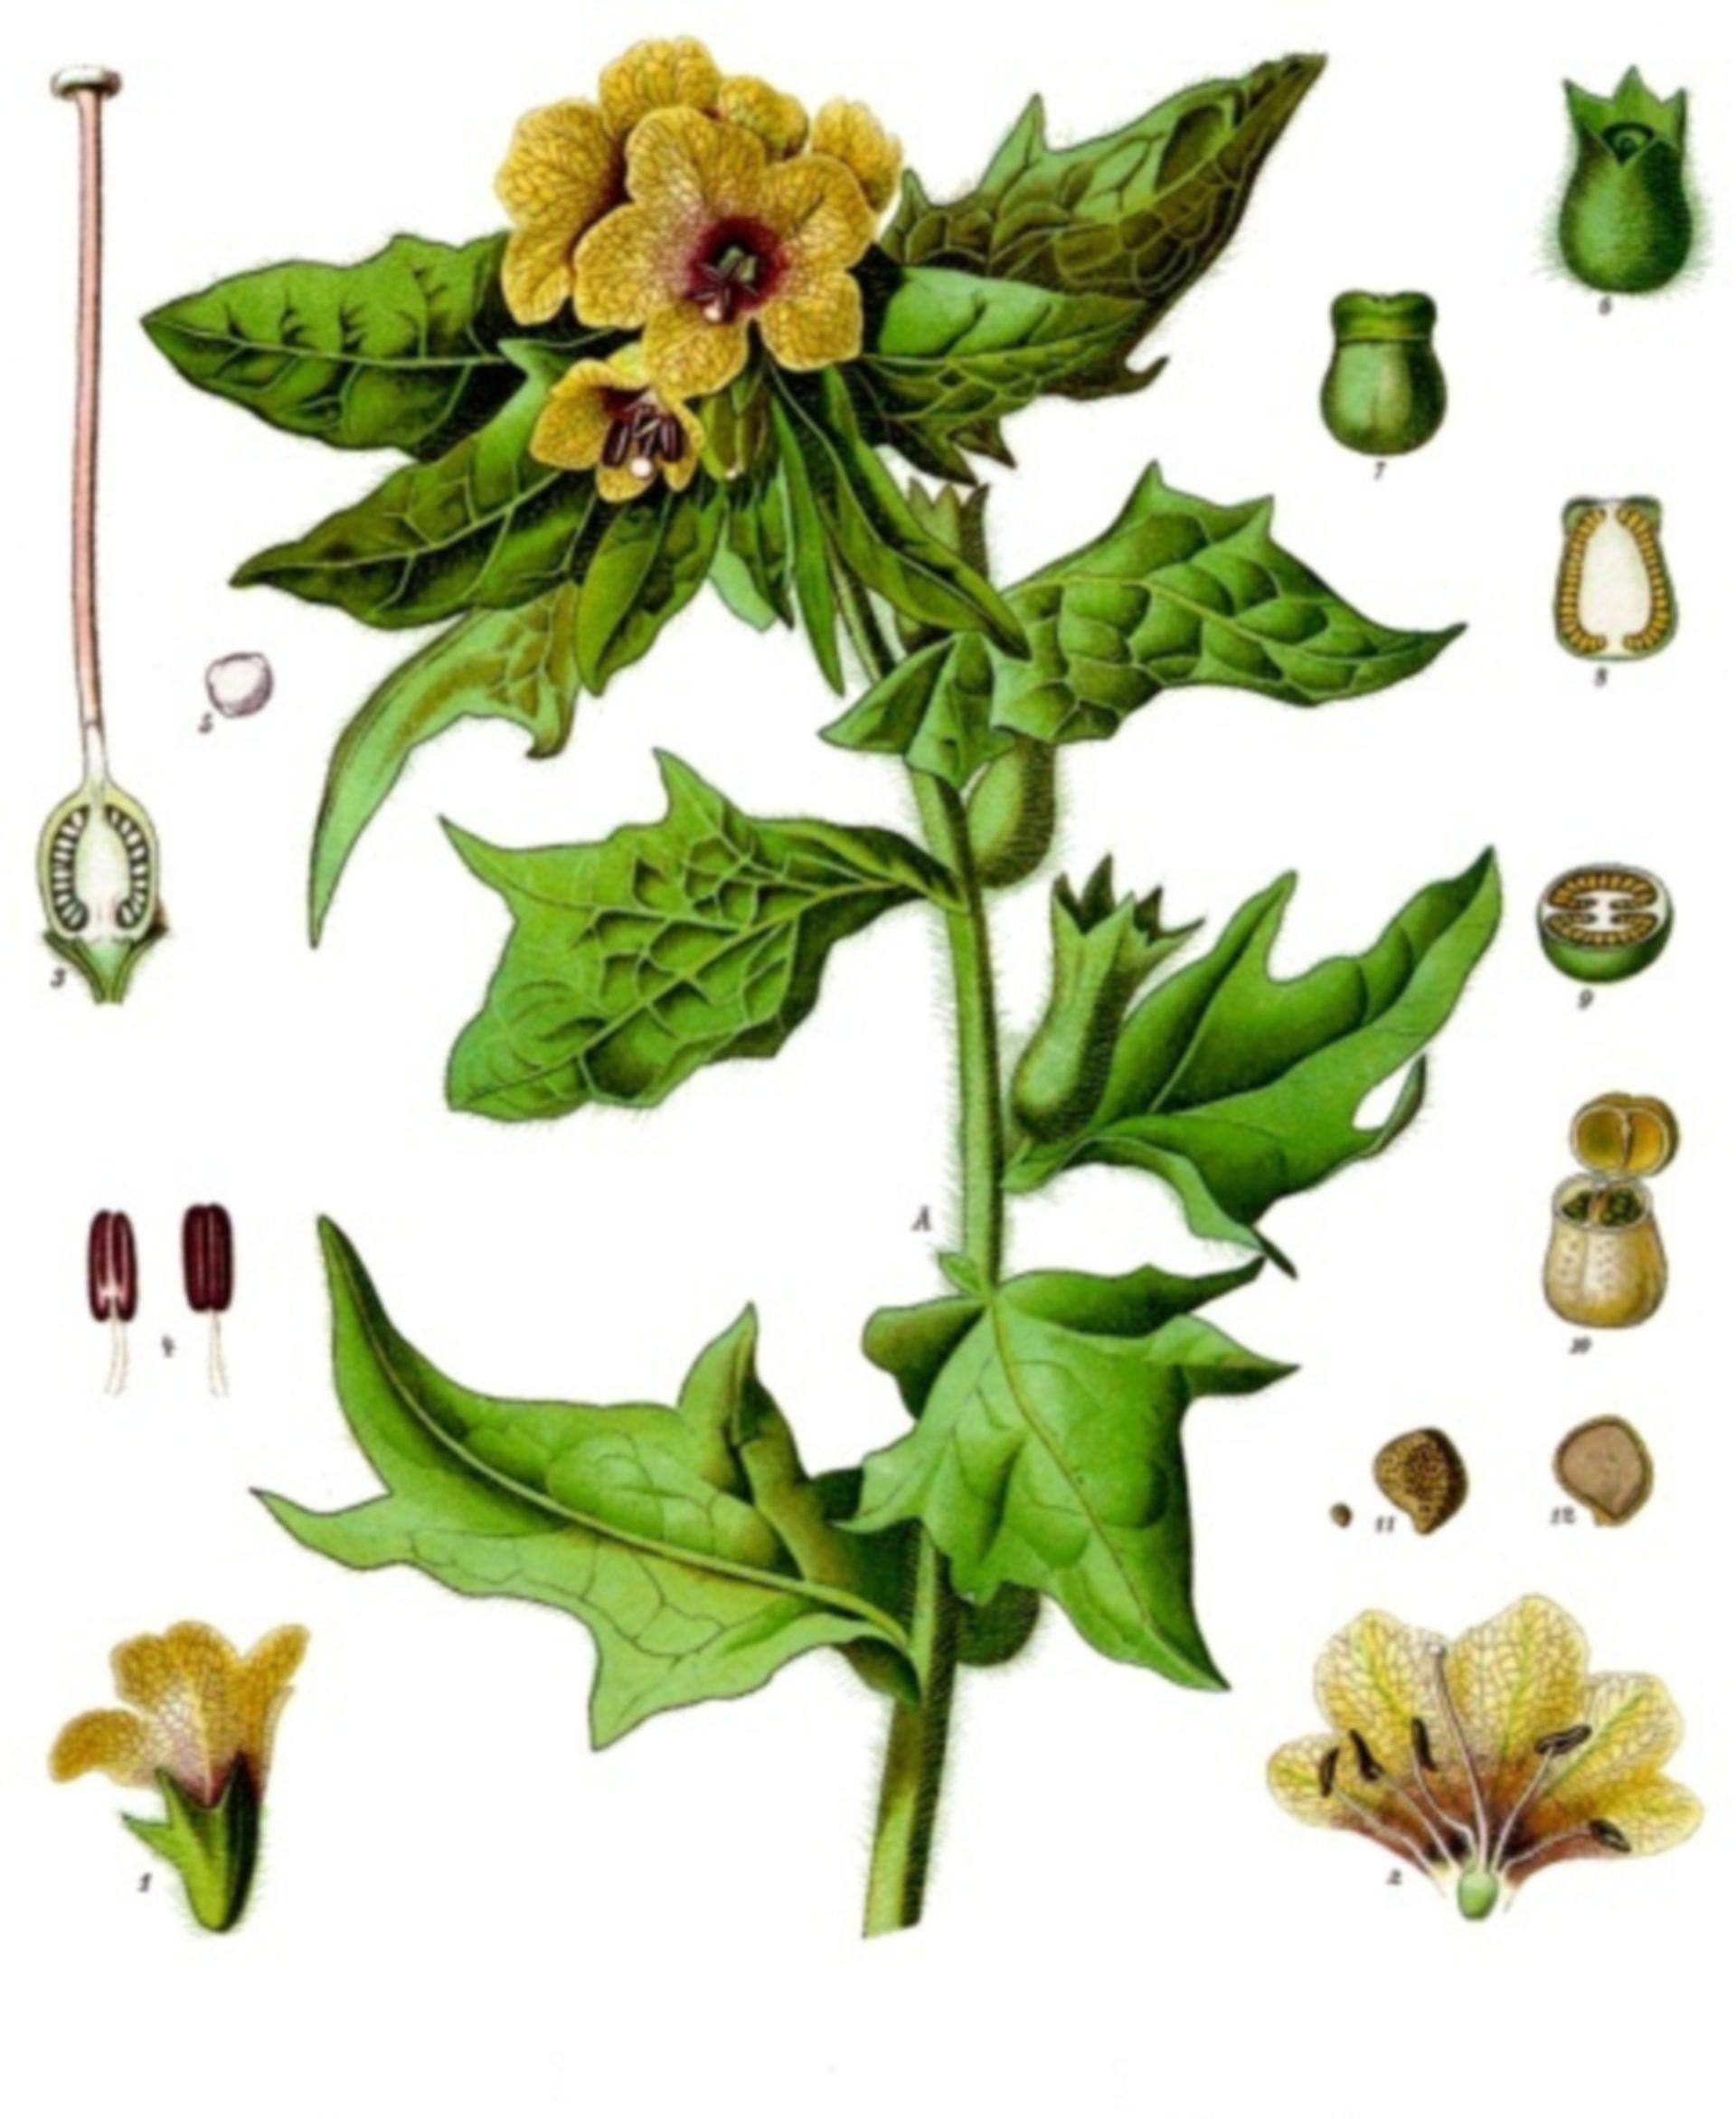 Hyoscyamus niger - giusquiamo